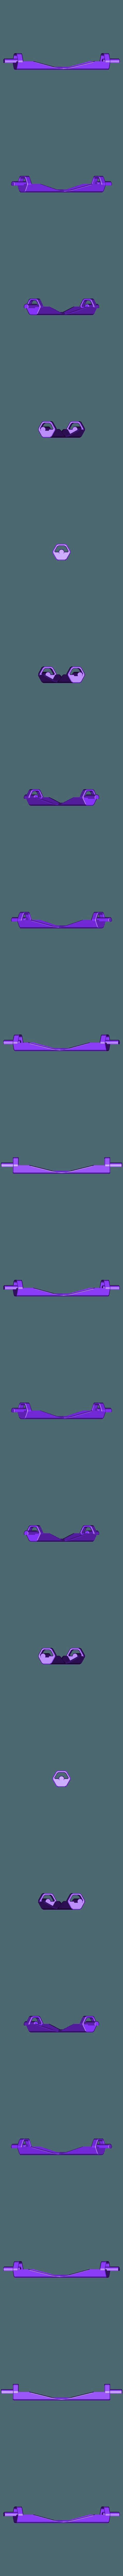 Tray 2.stl Download free STL file Clockwork pen carousel • 3D printing template, EvolvingExtrusions